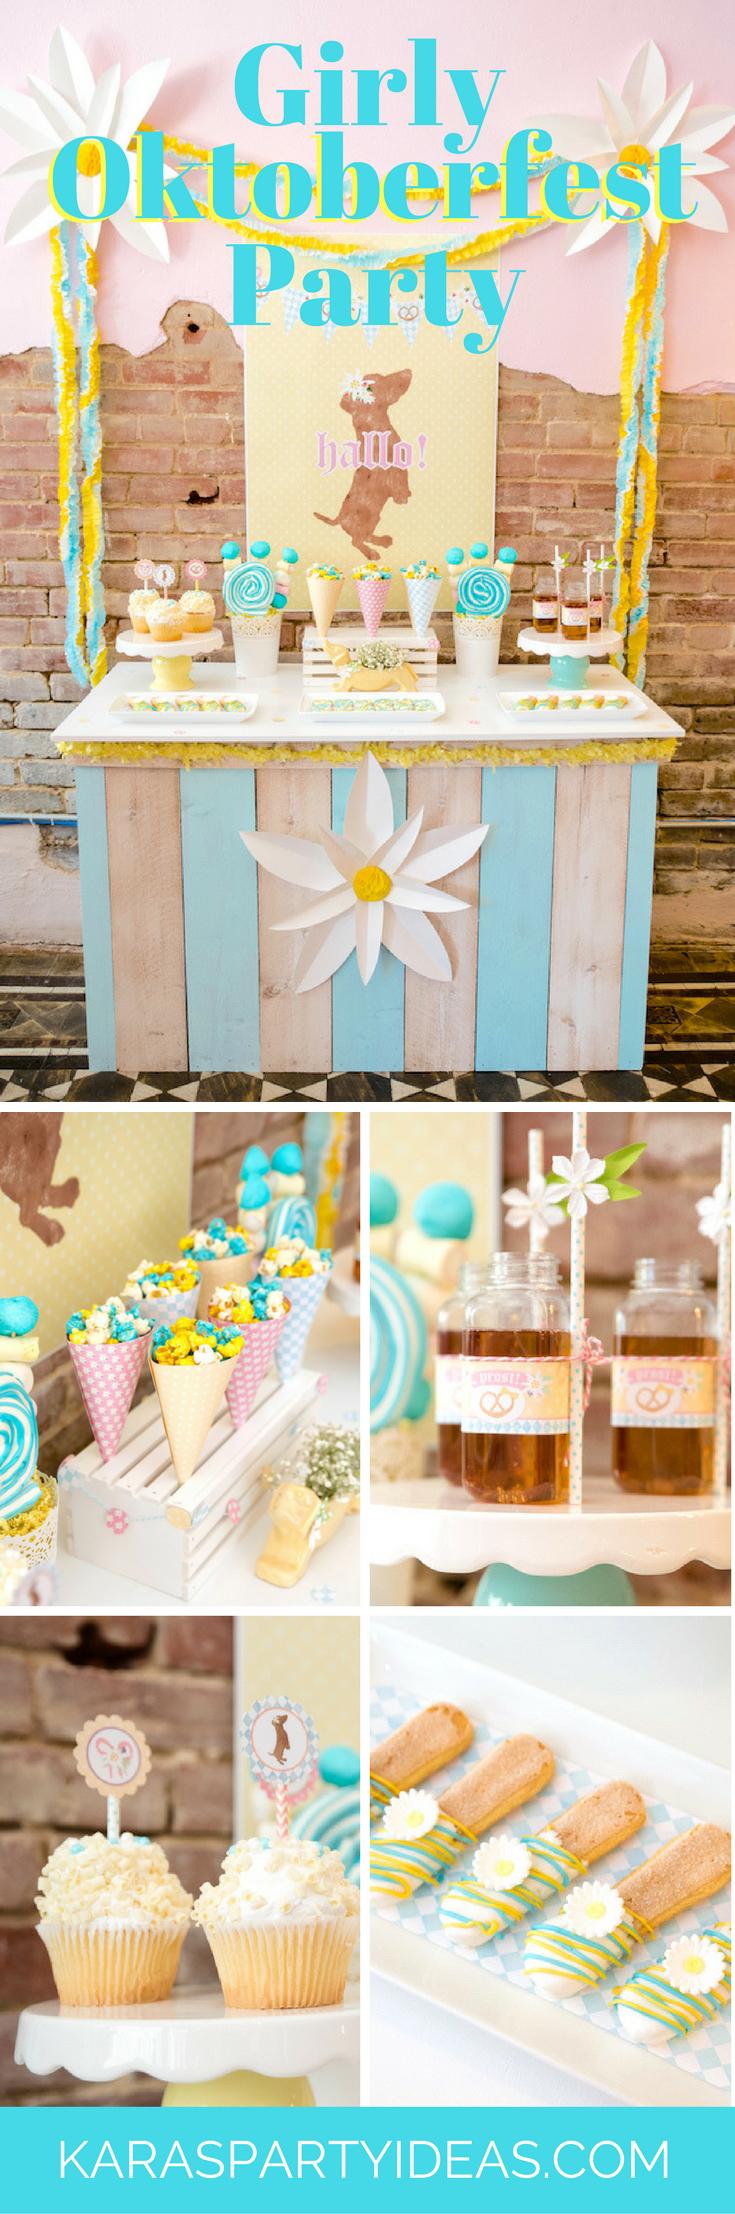 Girly Oktoberfest Party - Karas Party Ideas via KarasPartyIdeas.com